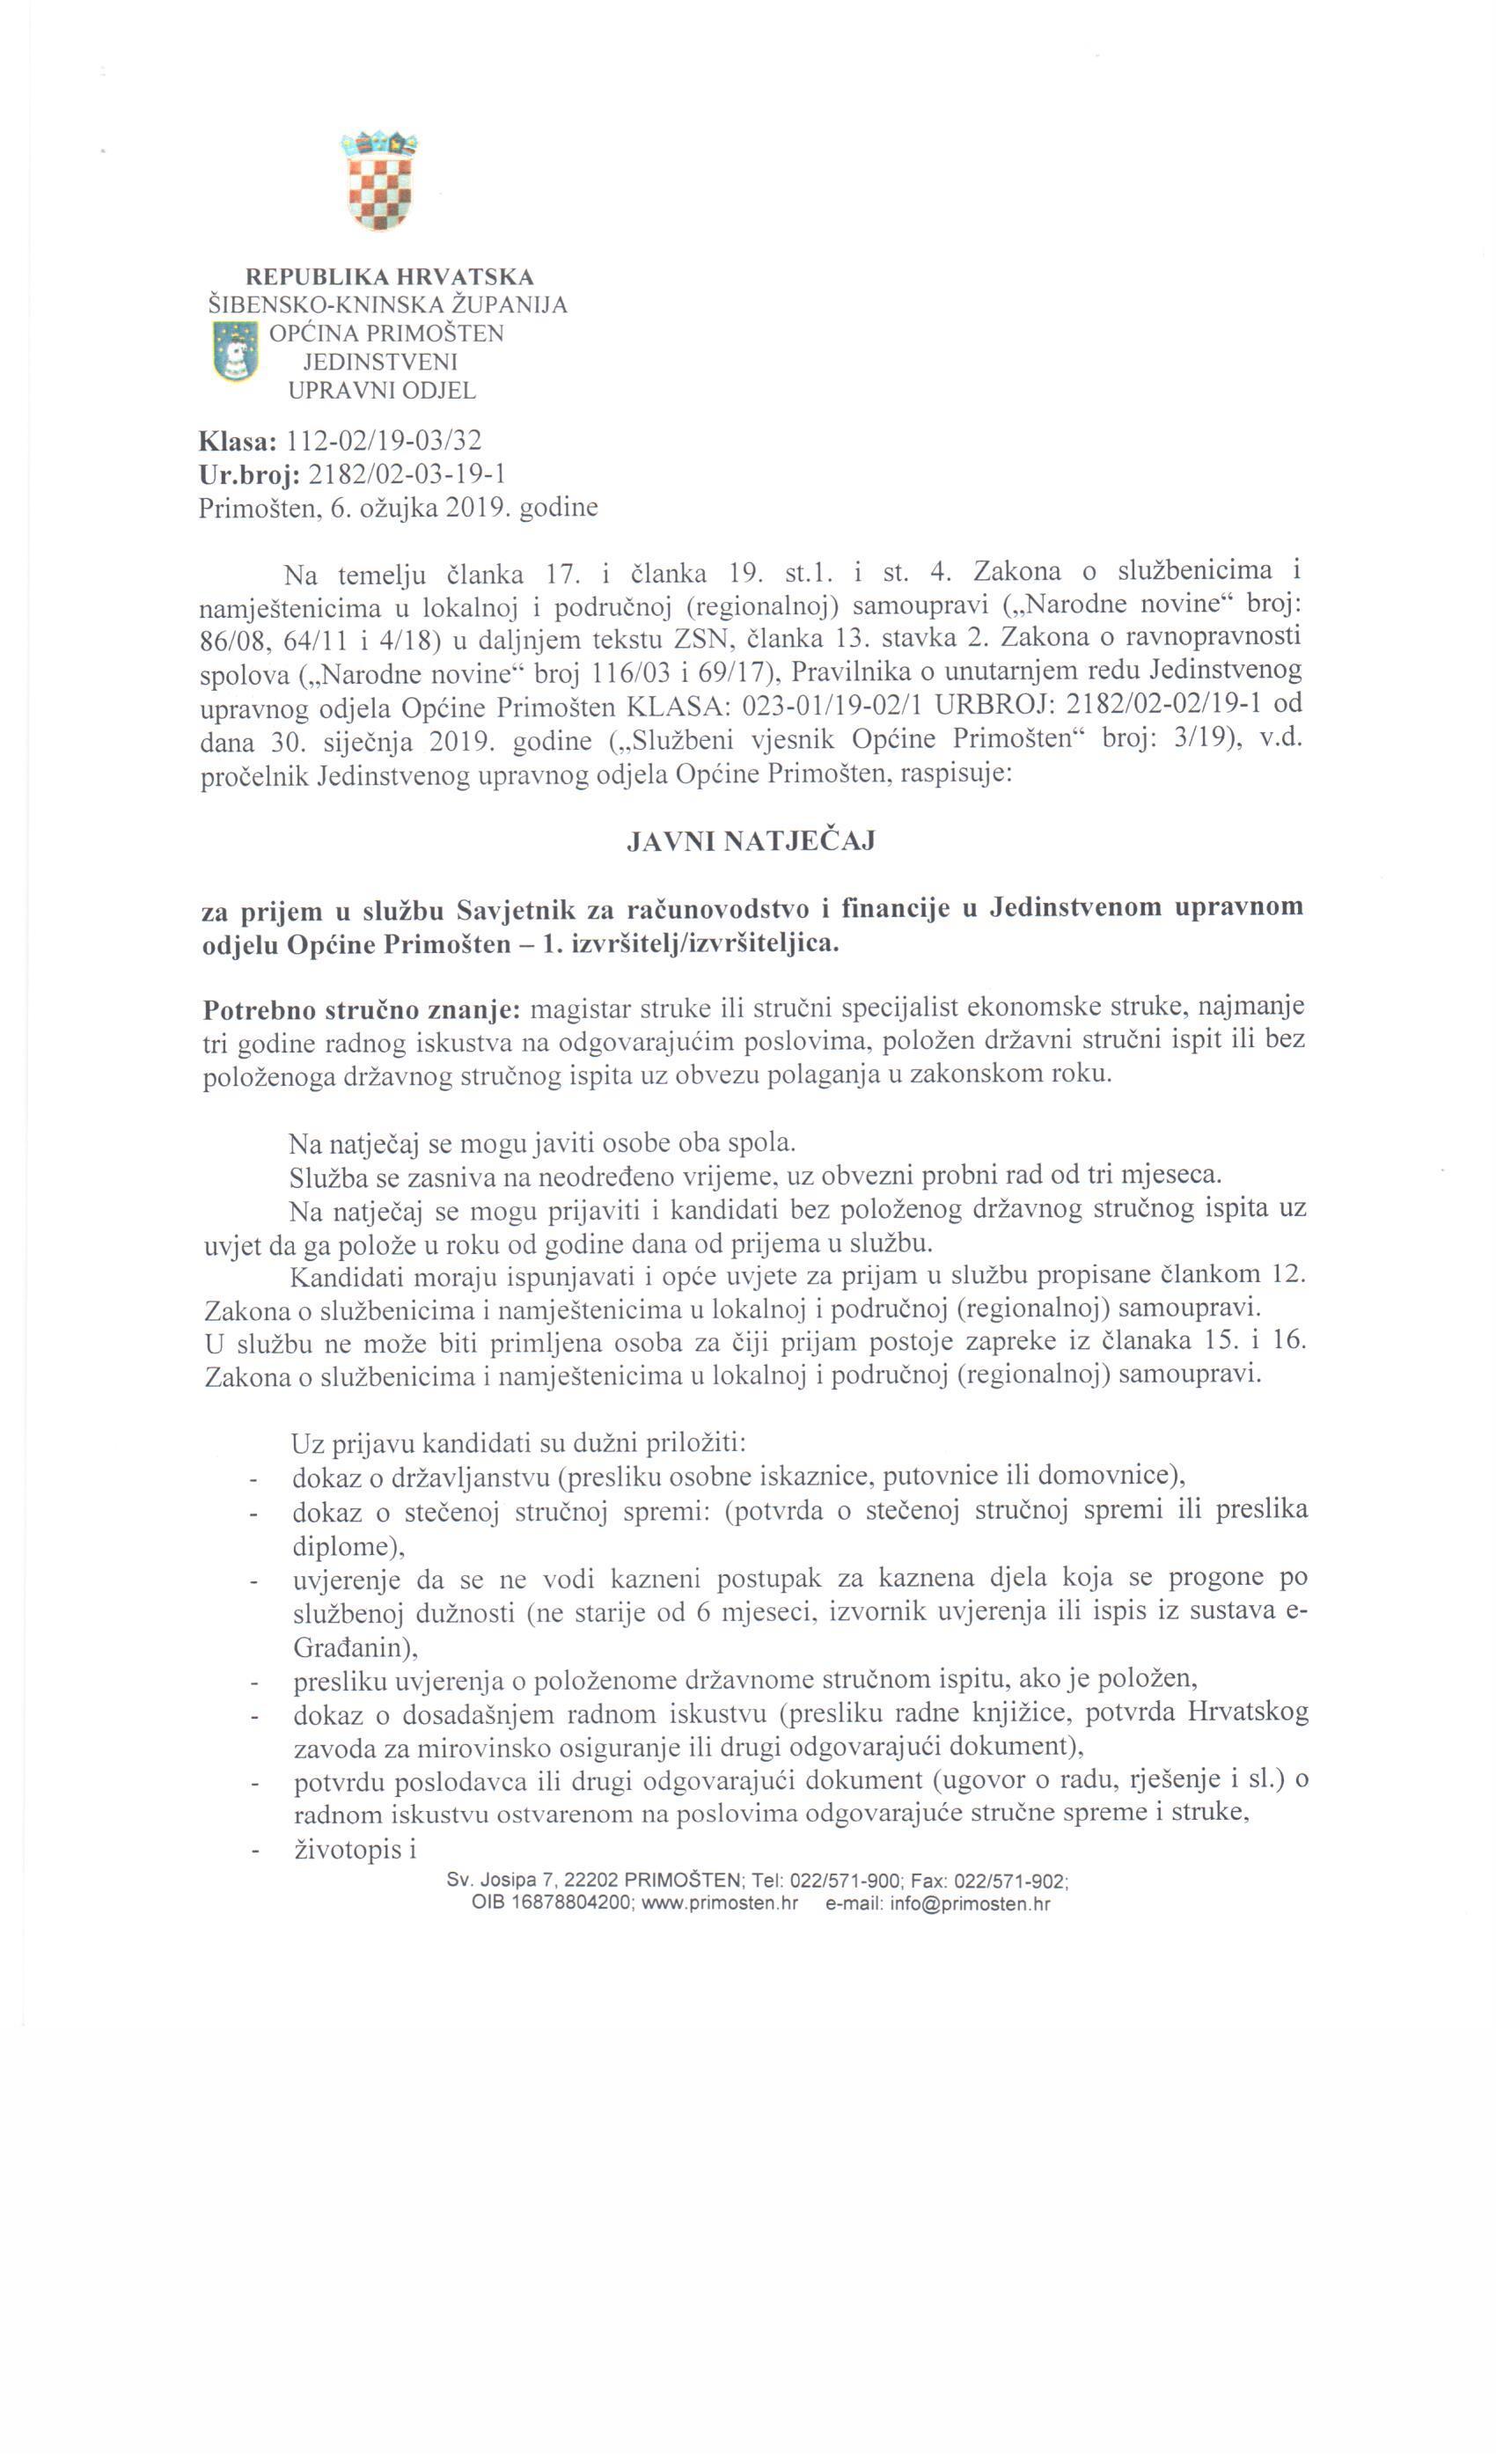 savjetnik_za_racunovodstvo0001